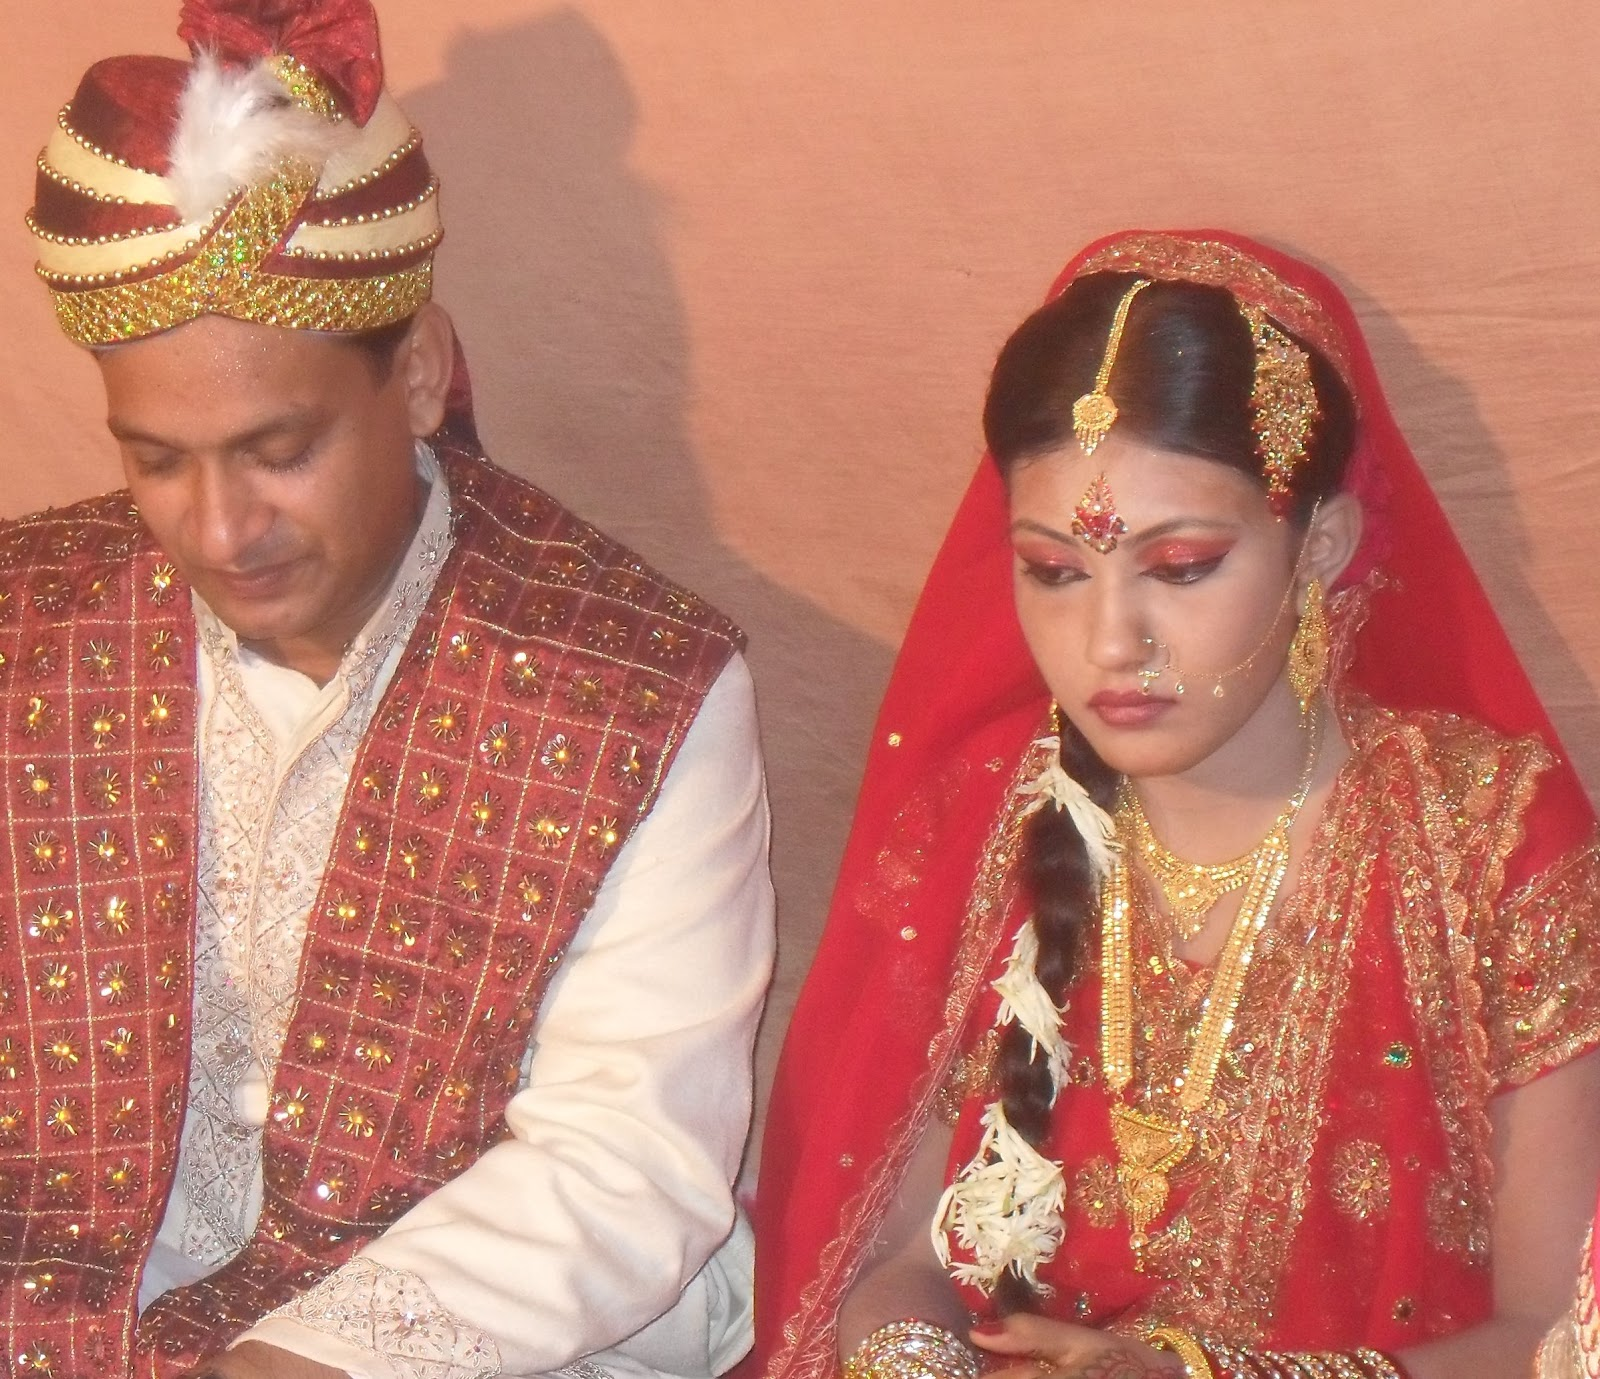 village marriage in bangladesh